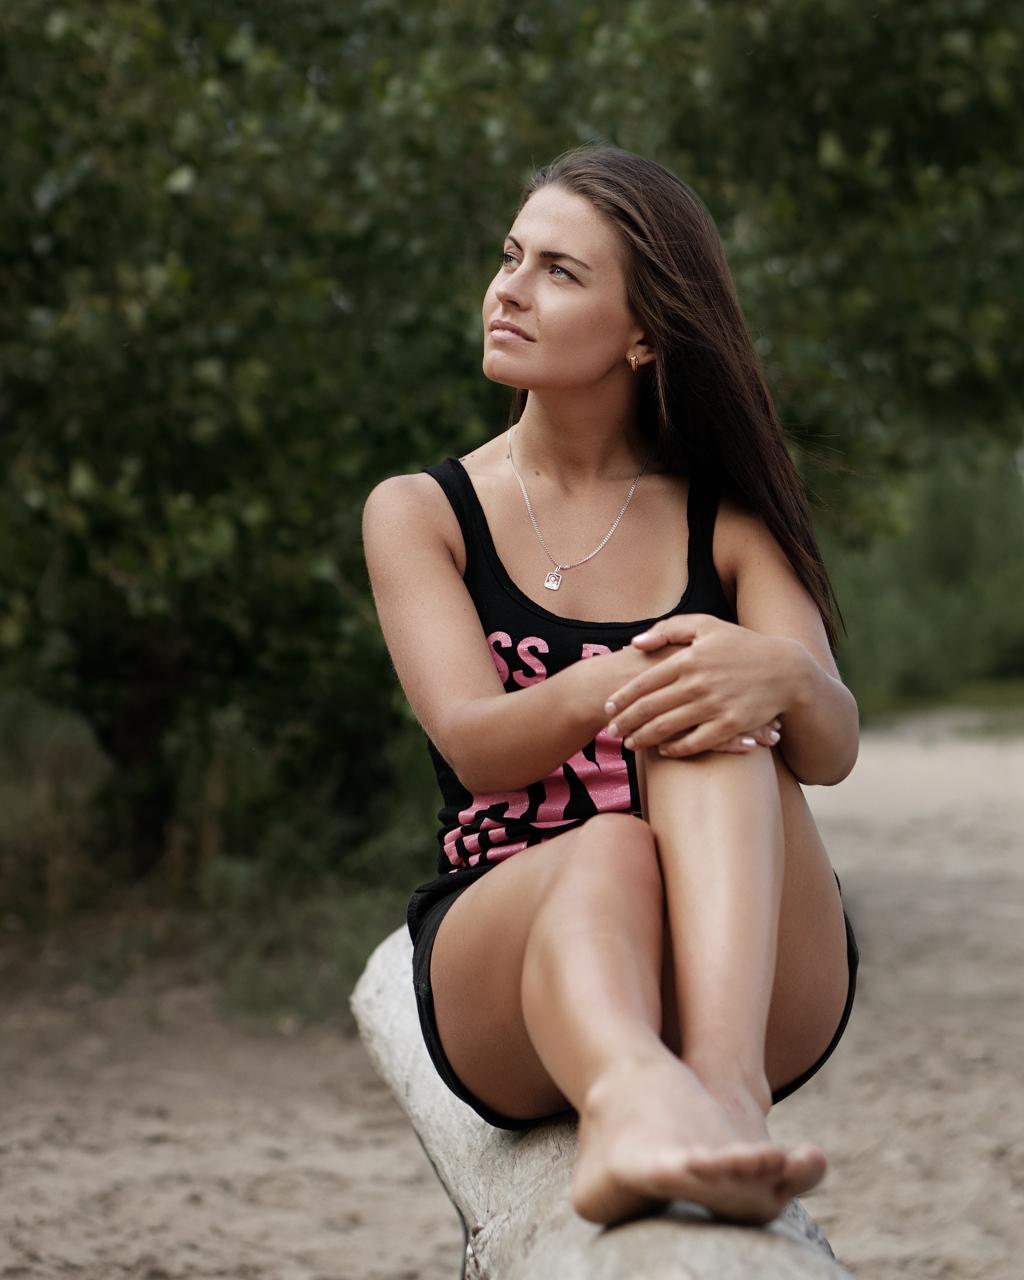 Model: Екатерина. Фотограф: EvgenYatsenko varganshik